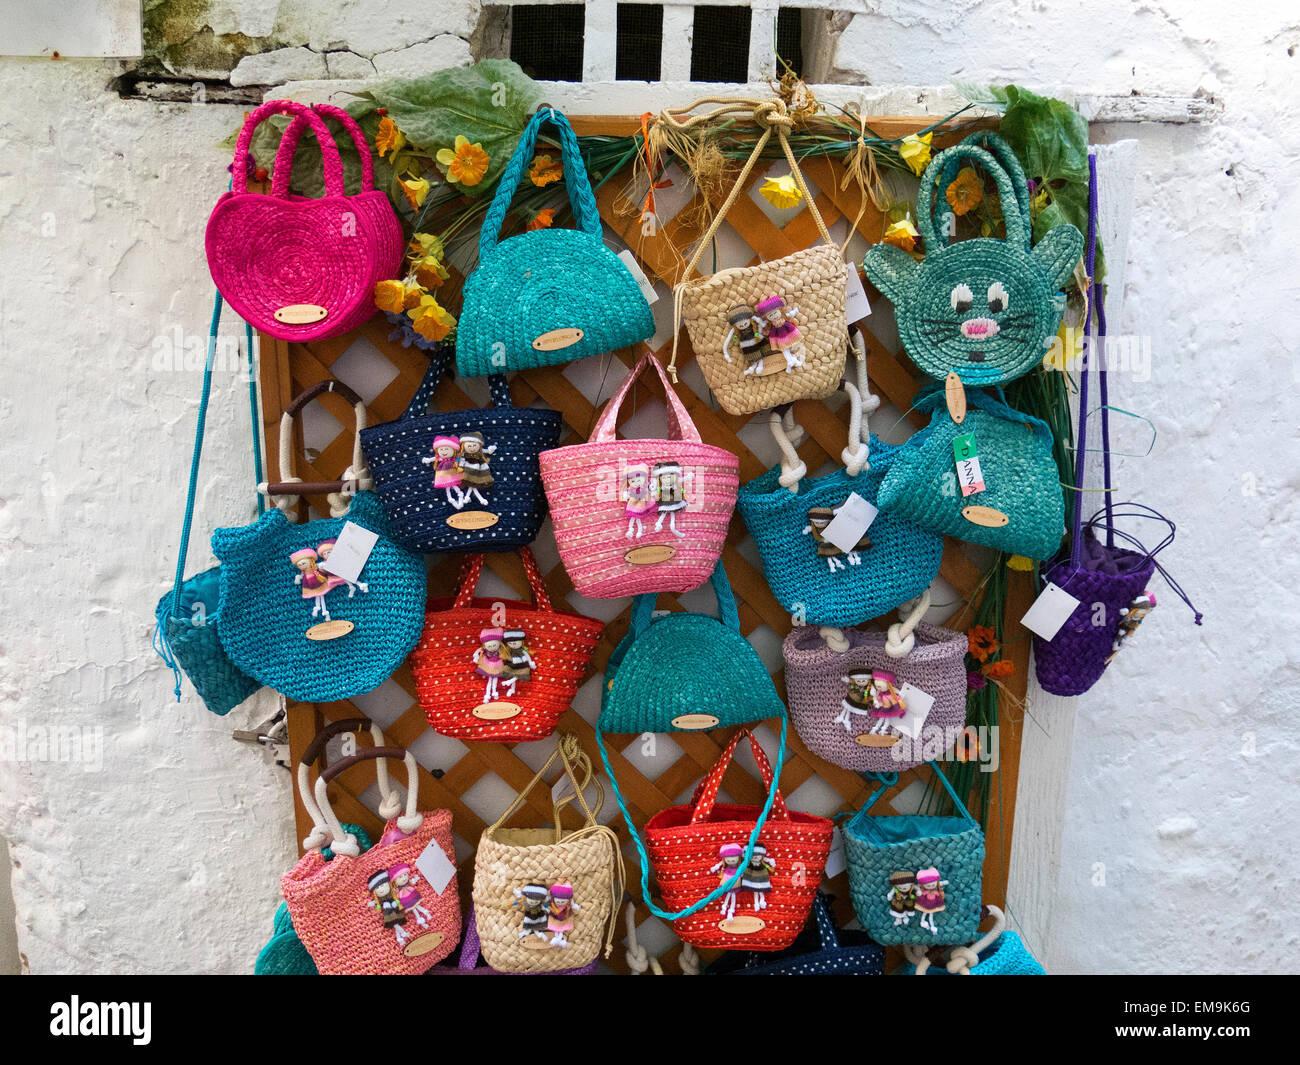 Sperlonga, handcraft for sale in the old town centre, Lazio, Italy - Stock Image